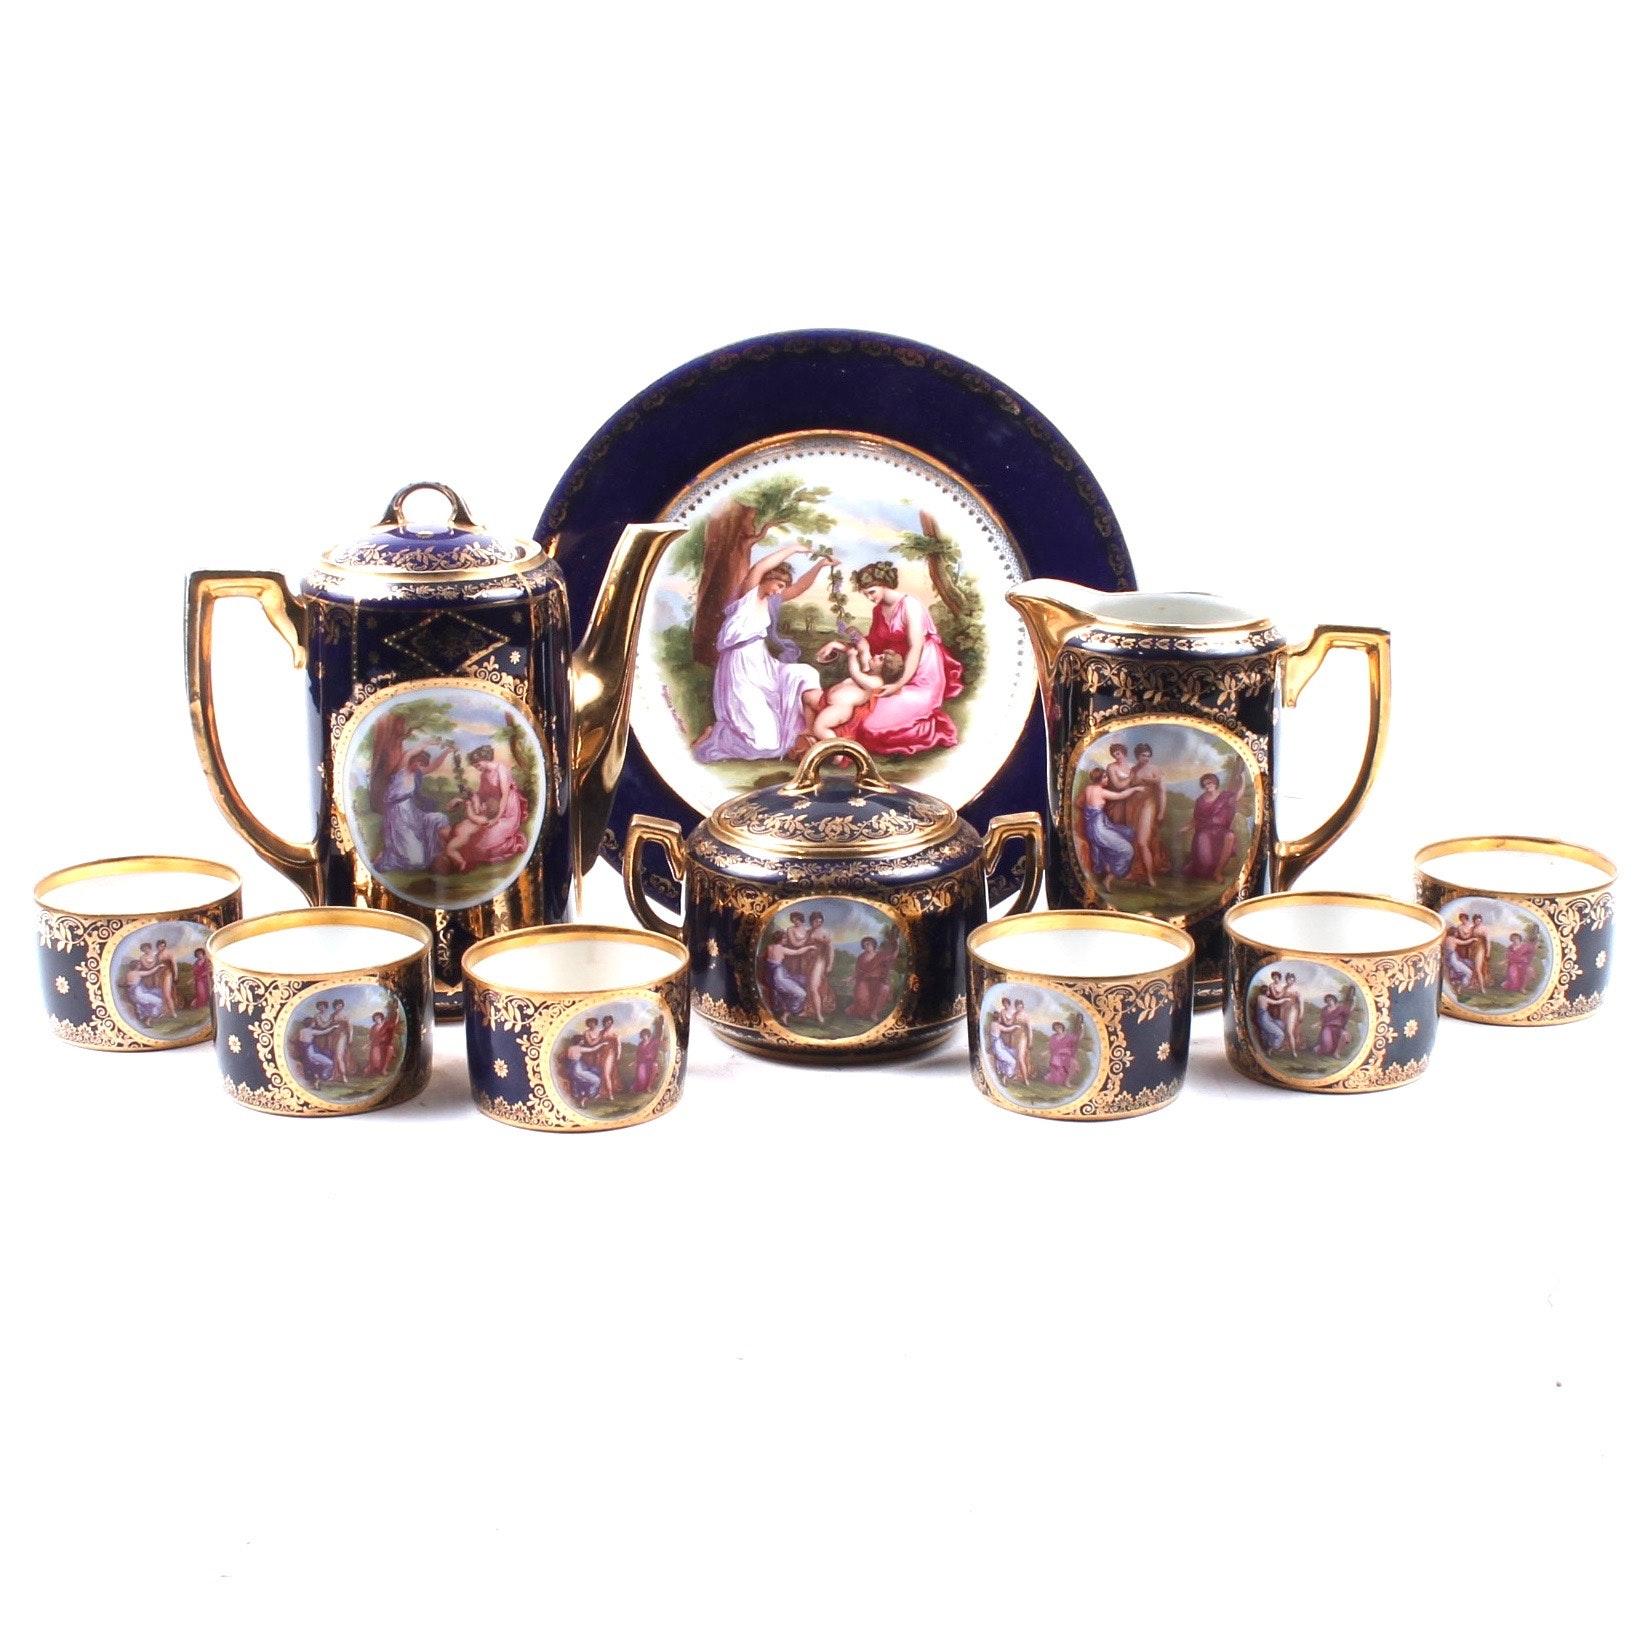 O&EG Royal Austria Cobalt Porcelain Tea Service